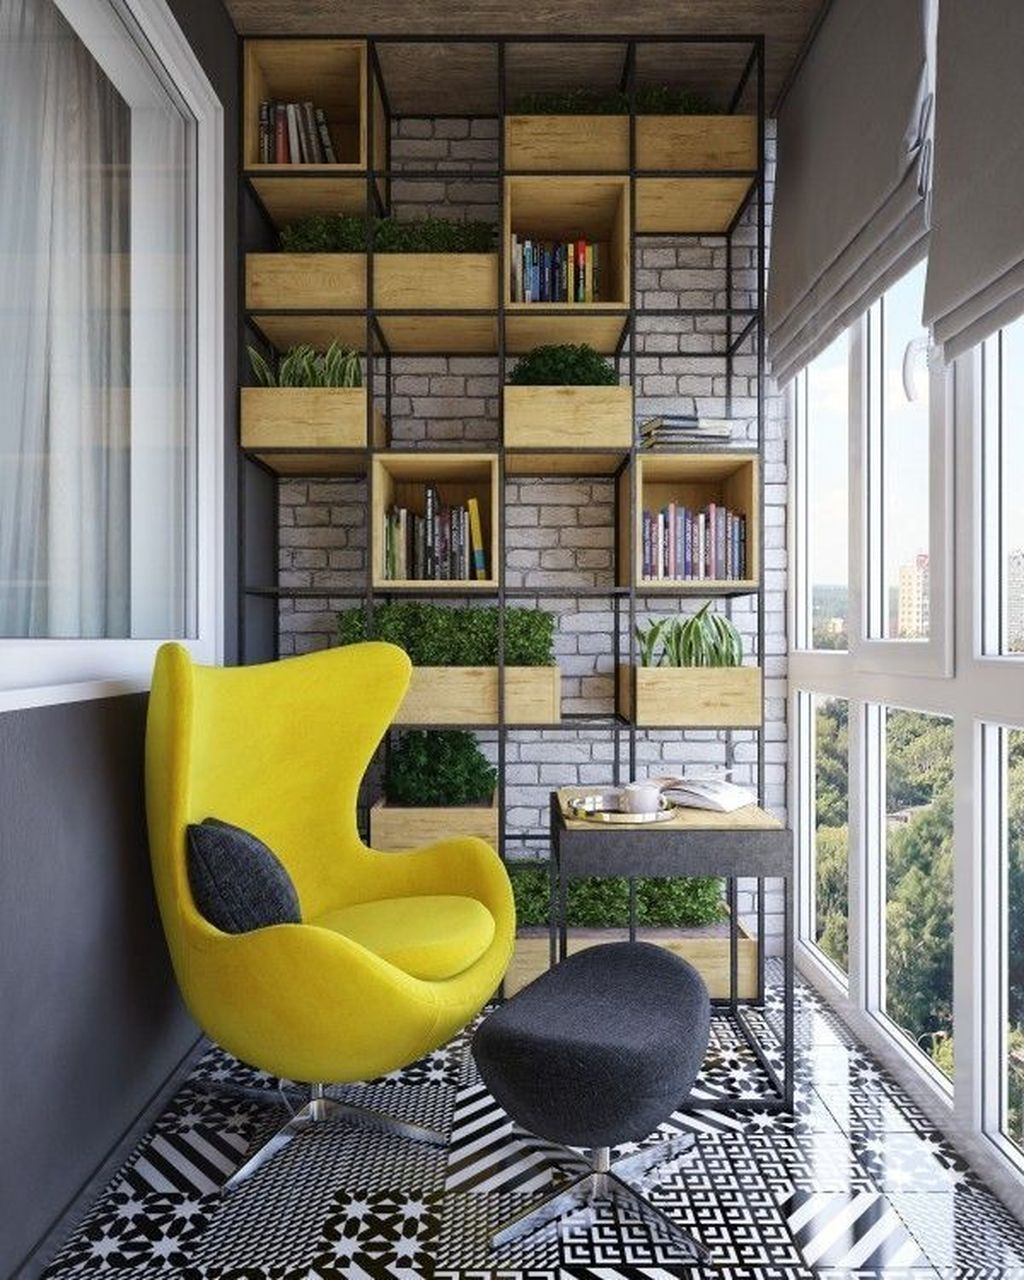 Мягкое кресло на балконе